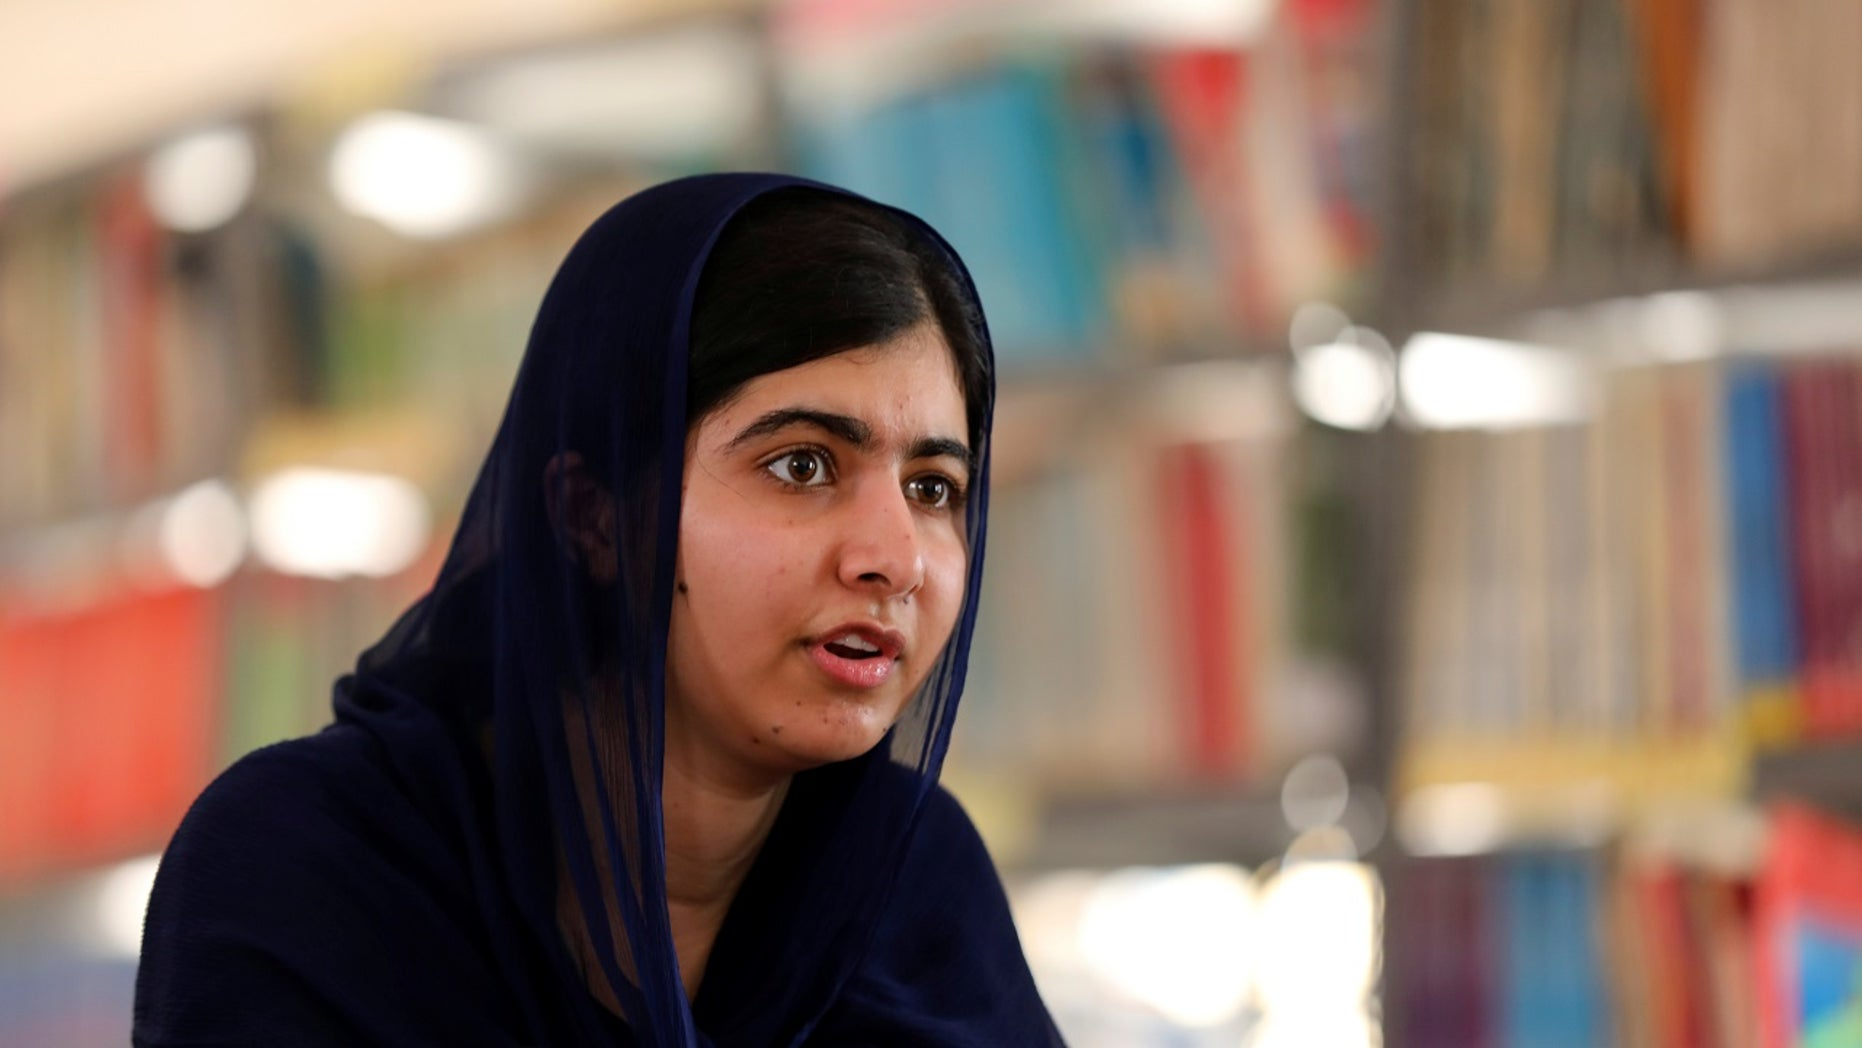 Nobel laureate Malala Yousafzai speaks during an interview with Reuters in Maiduguri, Nigeria, July 18, 2017.